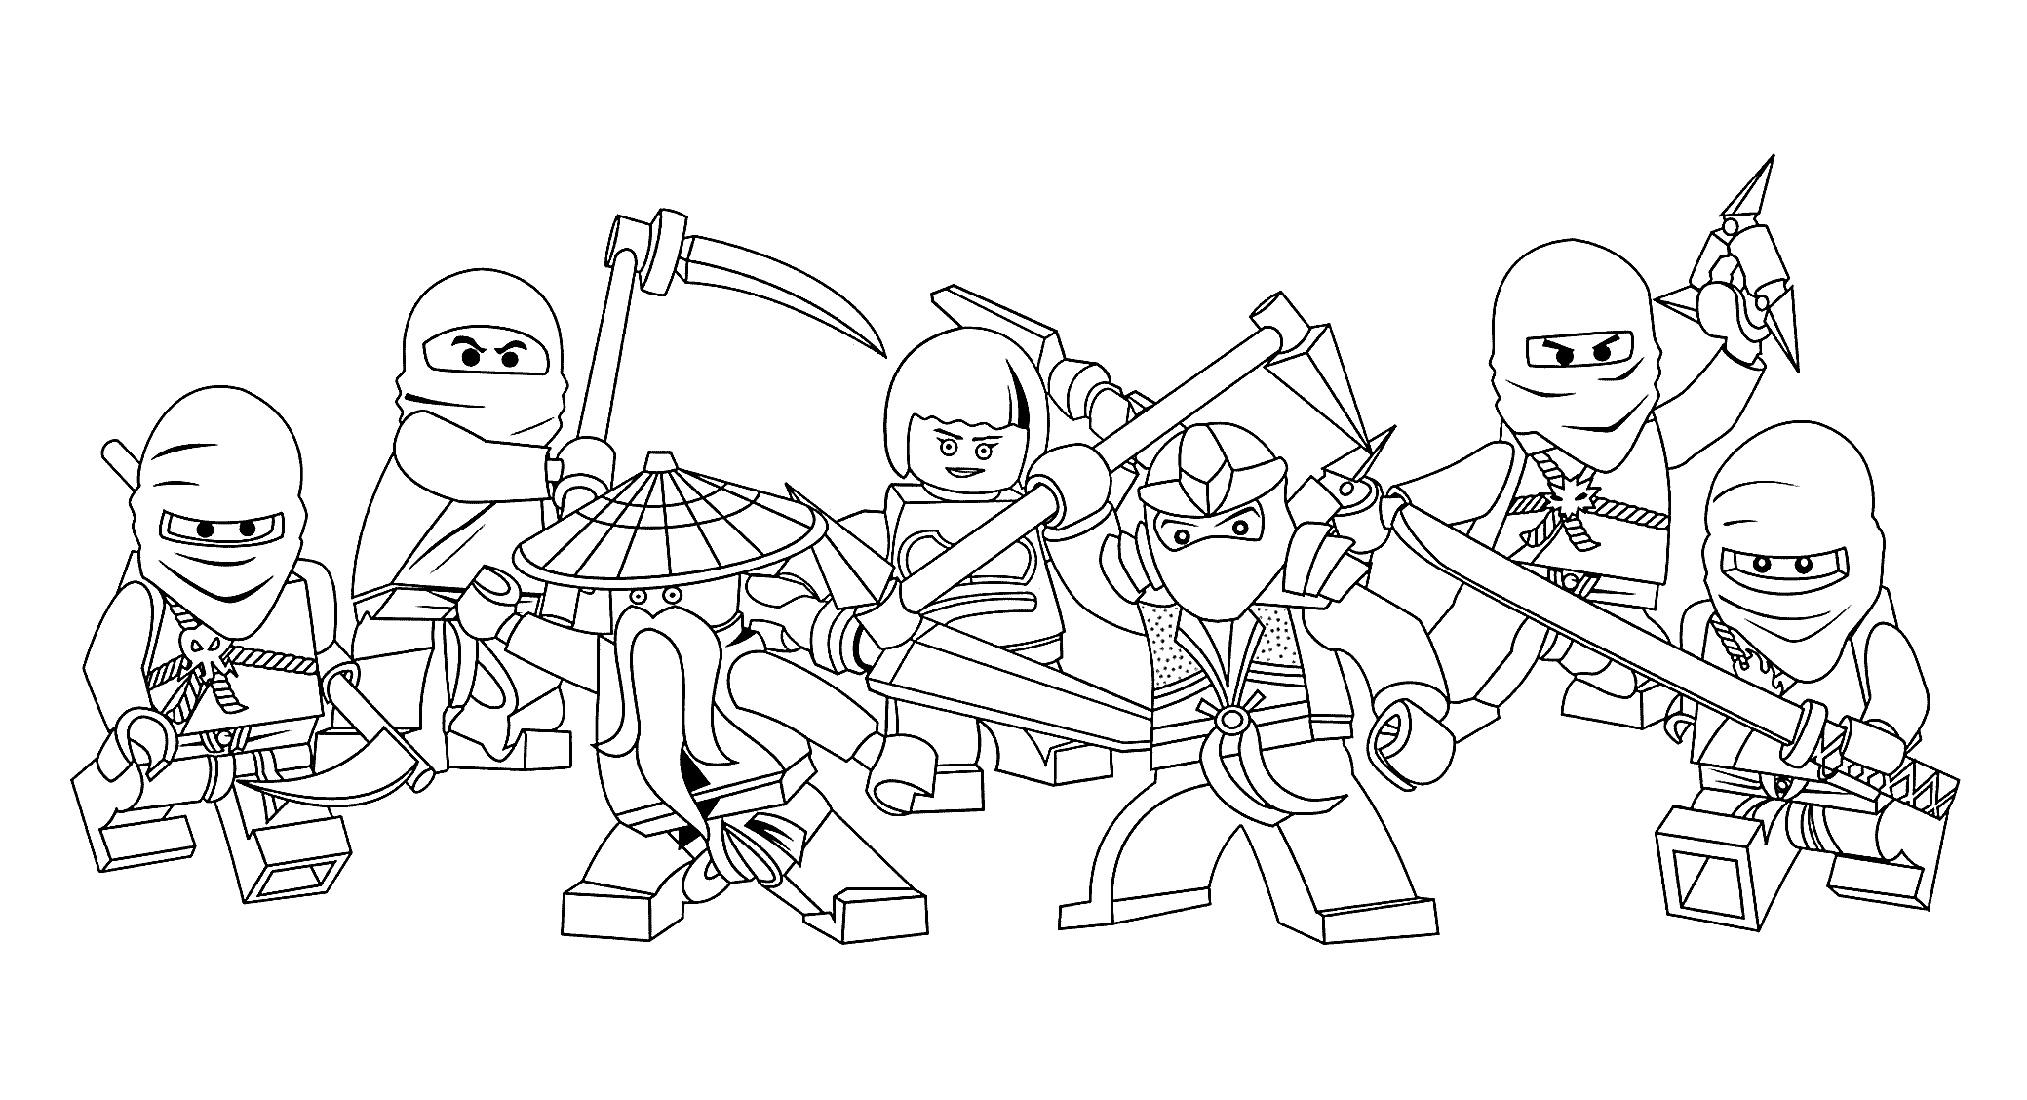 Lego Ninjago Coloring Pages Various Poses